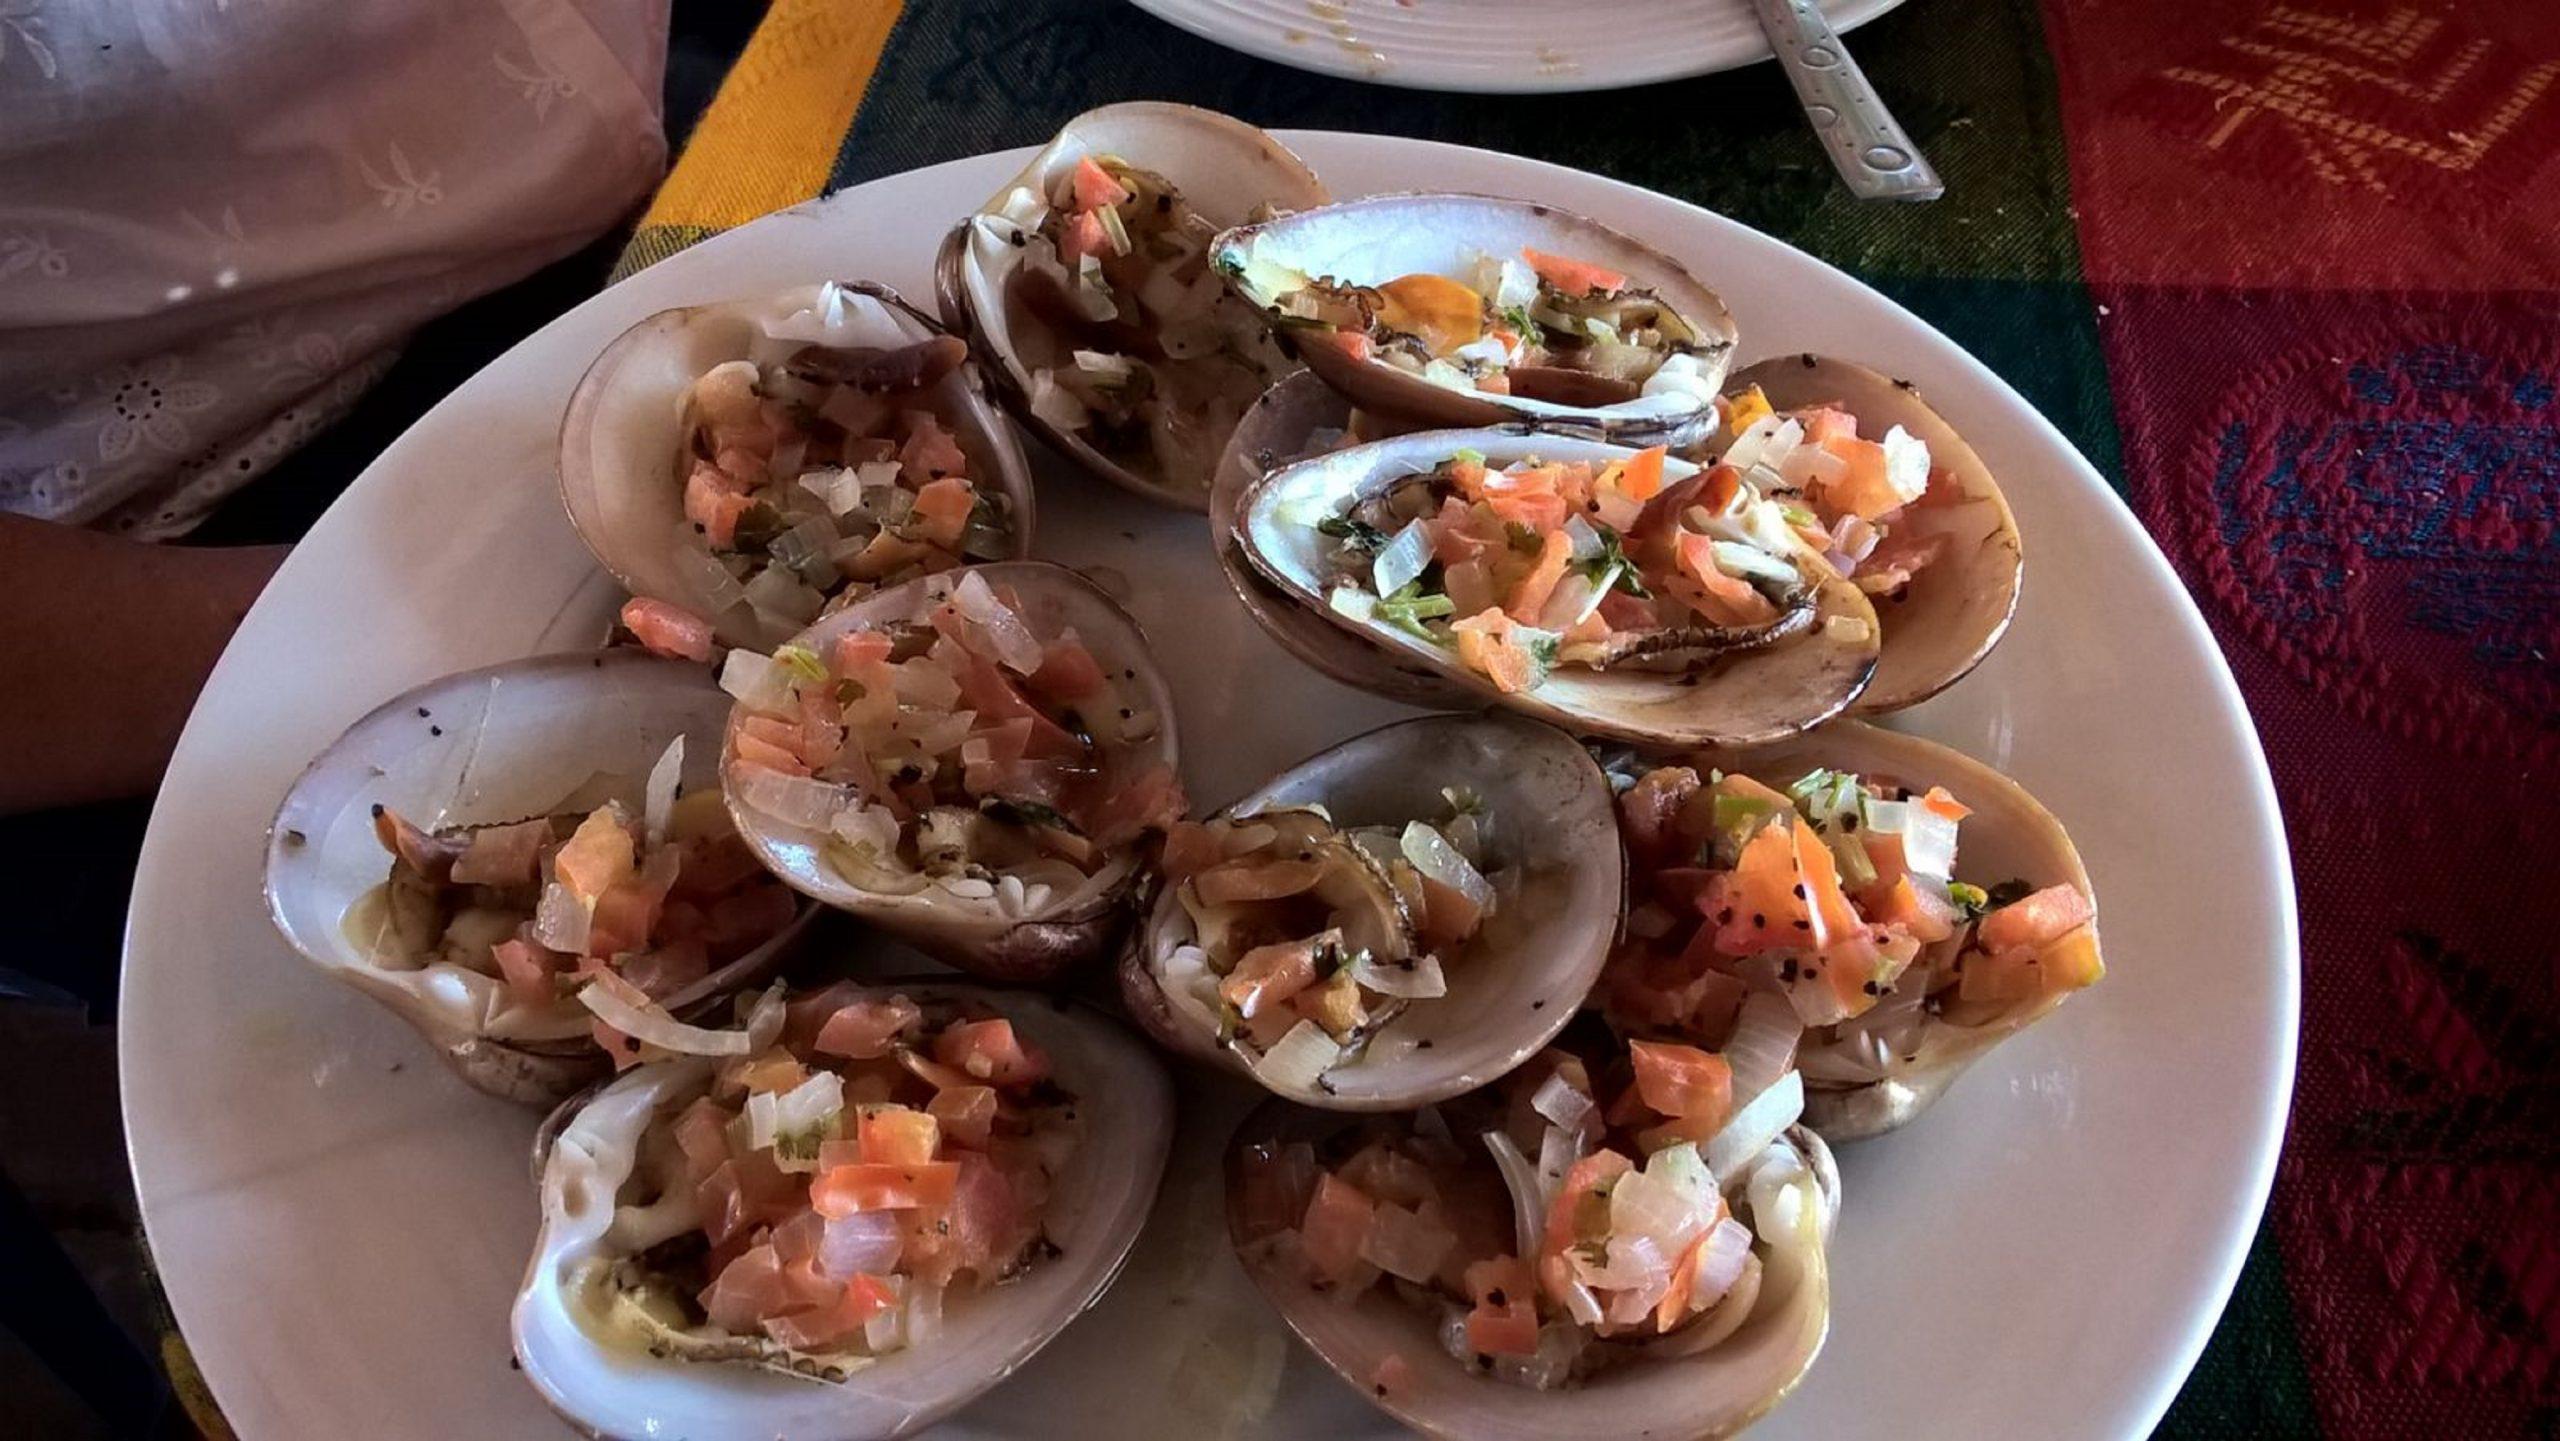 Baja California clams (almejas chocolatas) Loreto, Mexico Loreto - Baja California - Mexico - August 12, 2016. A typical delicatessen from Baja California deriving its name from the distinctive brown color.